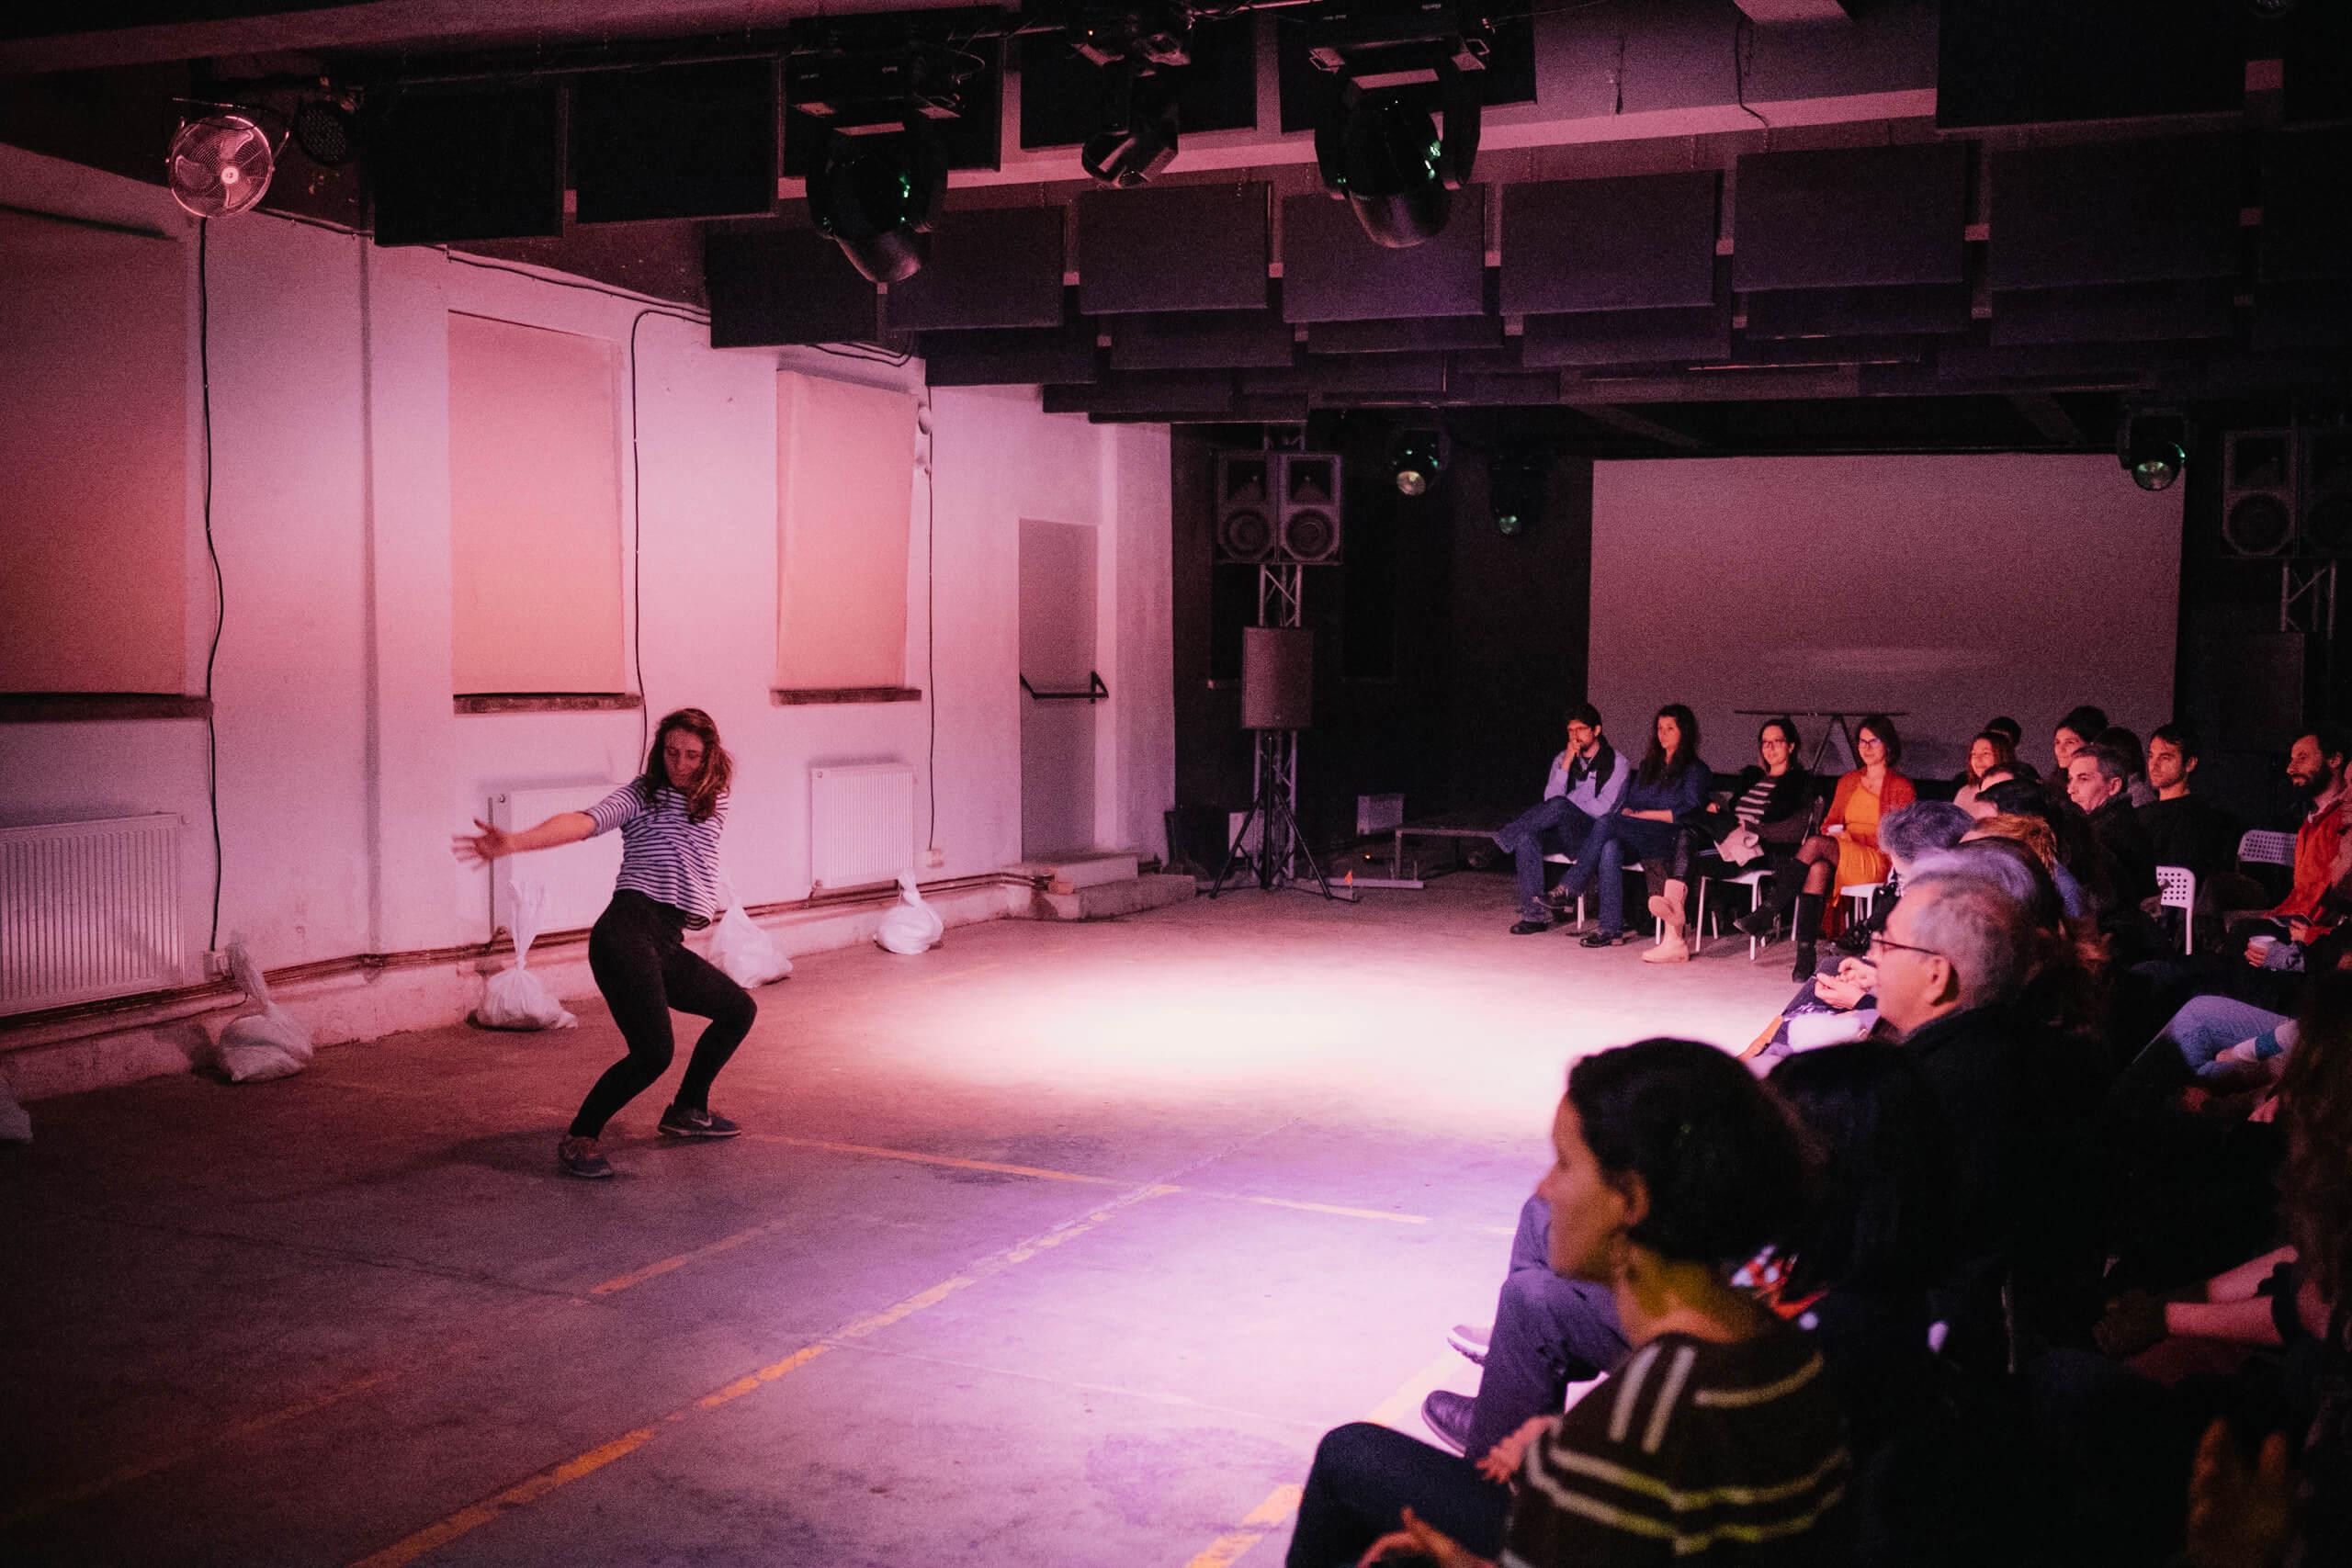 Interviu cu Anamaria Guguian pentru TabaradepicturaHobbyArt.org-imagine din spectacolul Migdalii infloriti